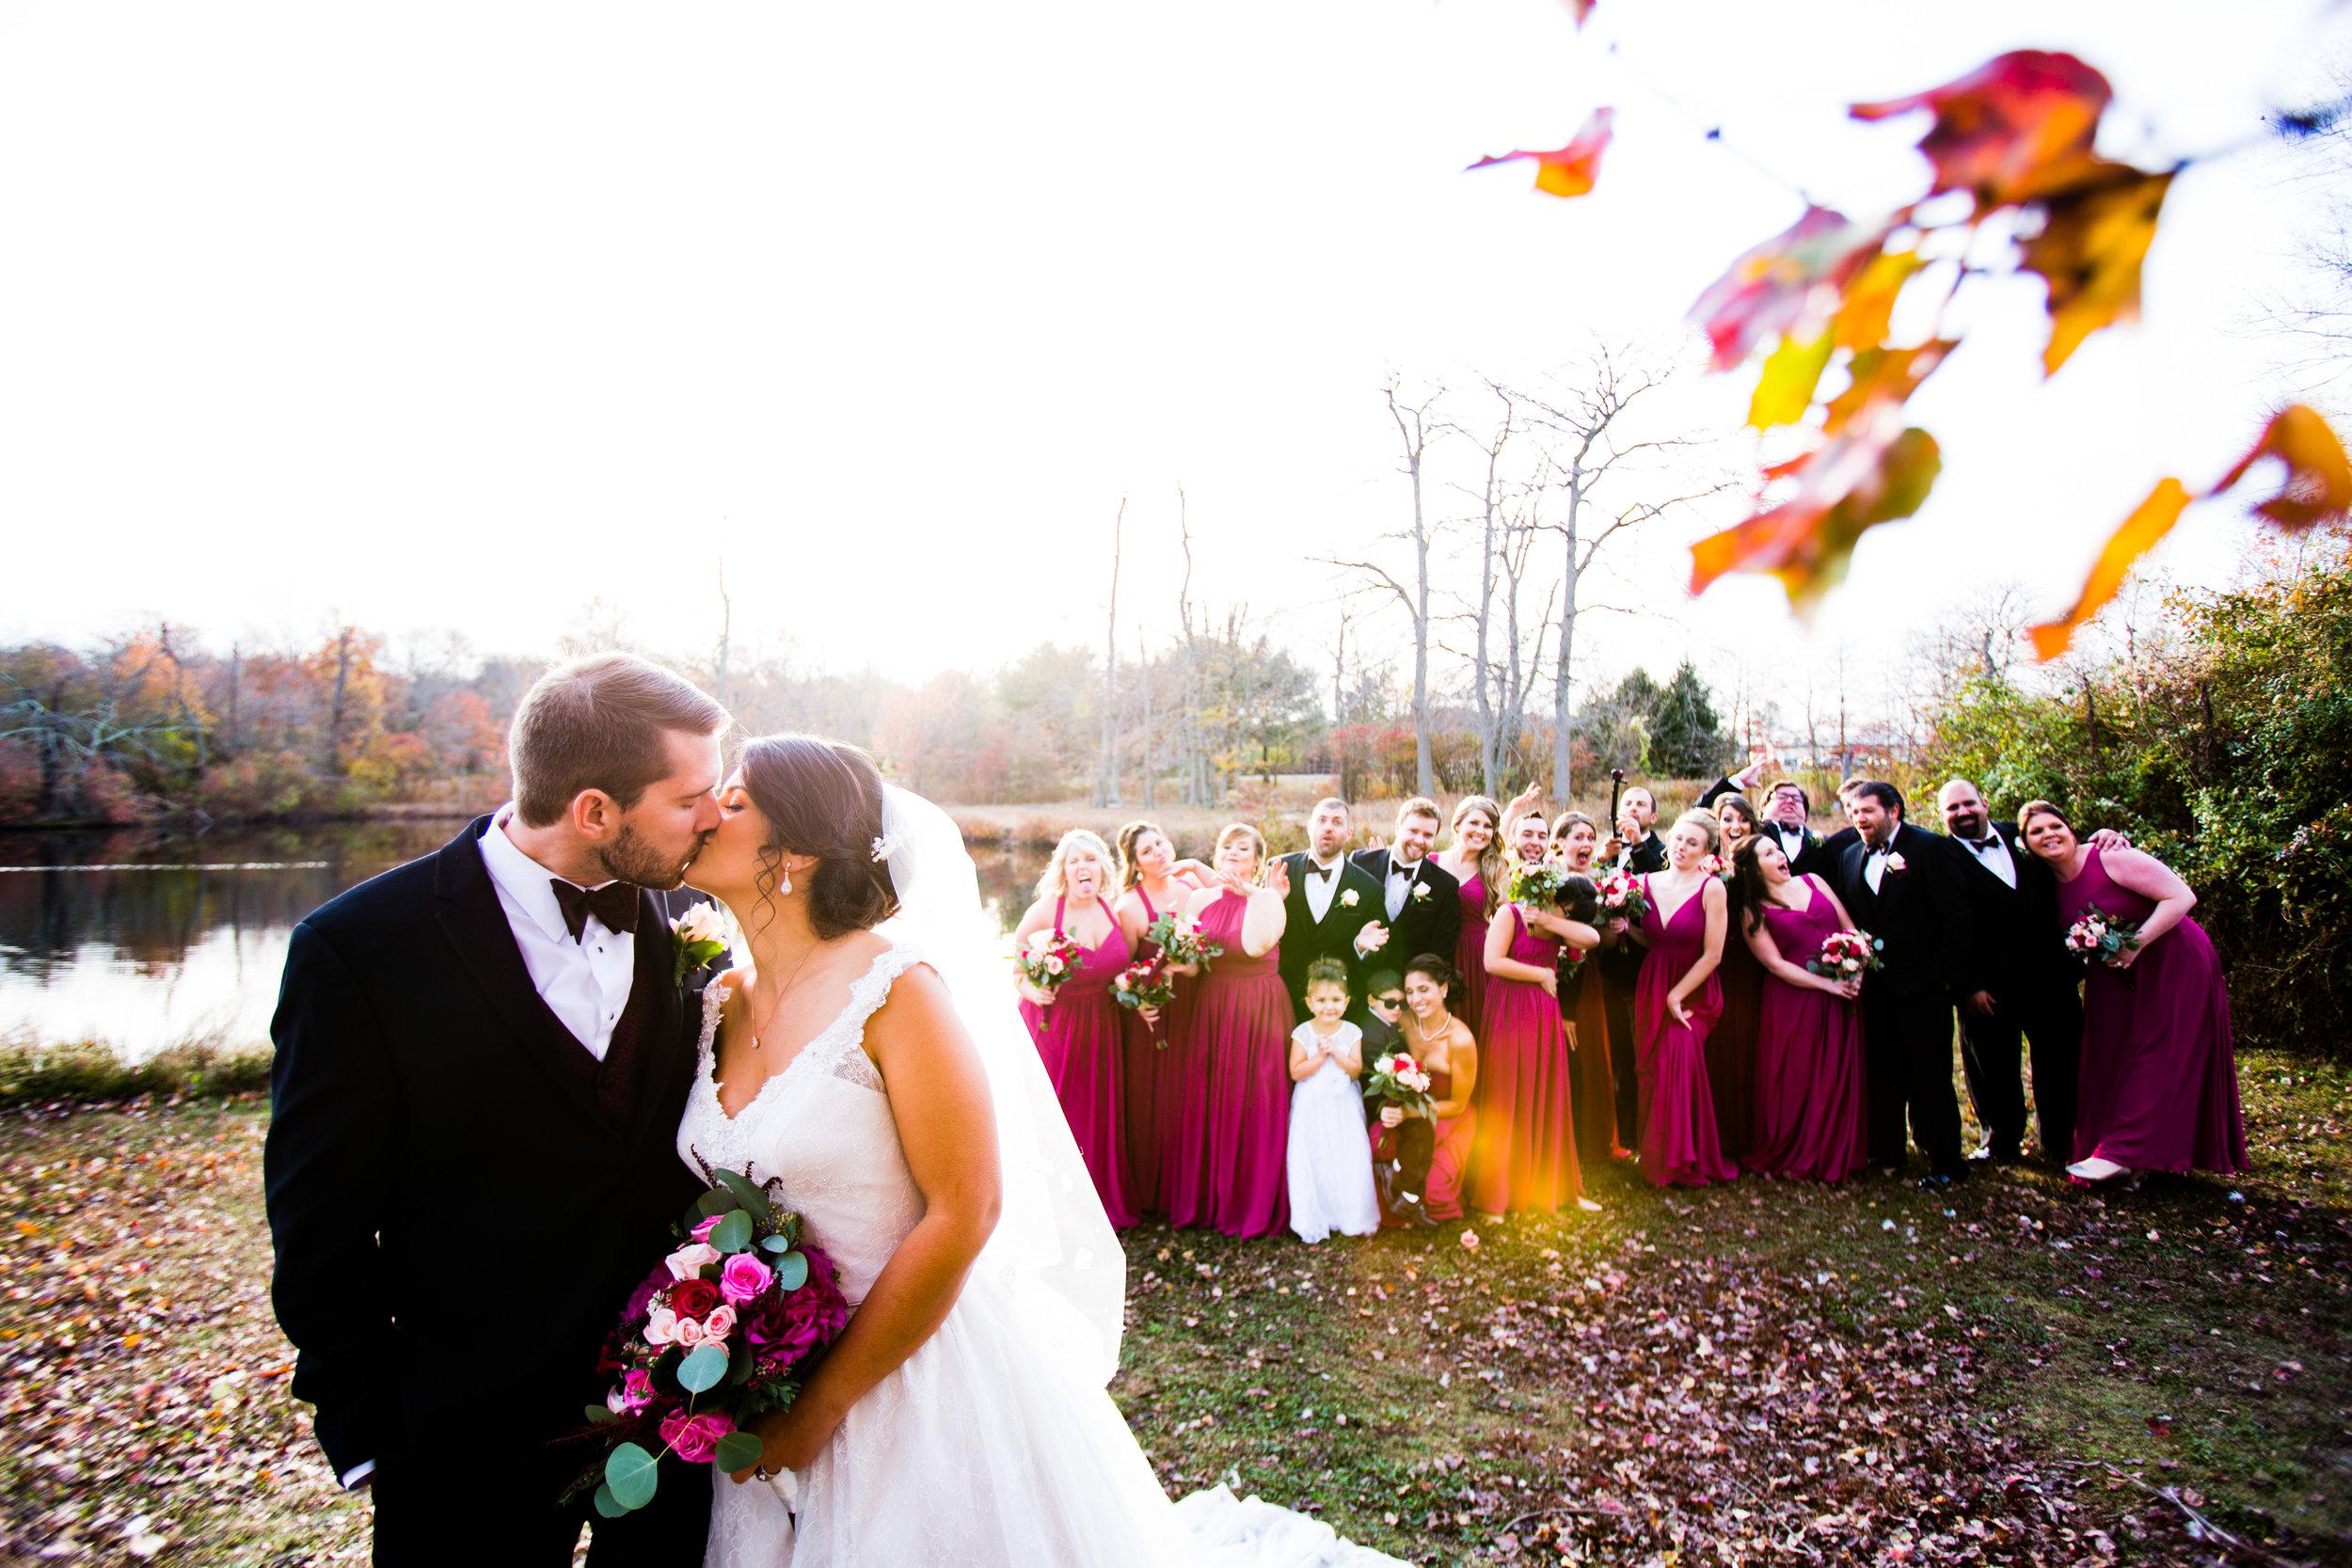 Luciens Manor Wedding Photos - 048.jpg